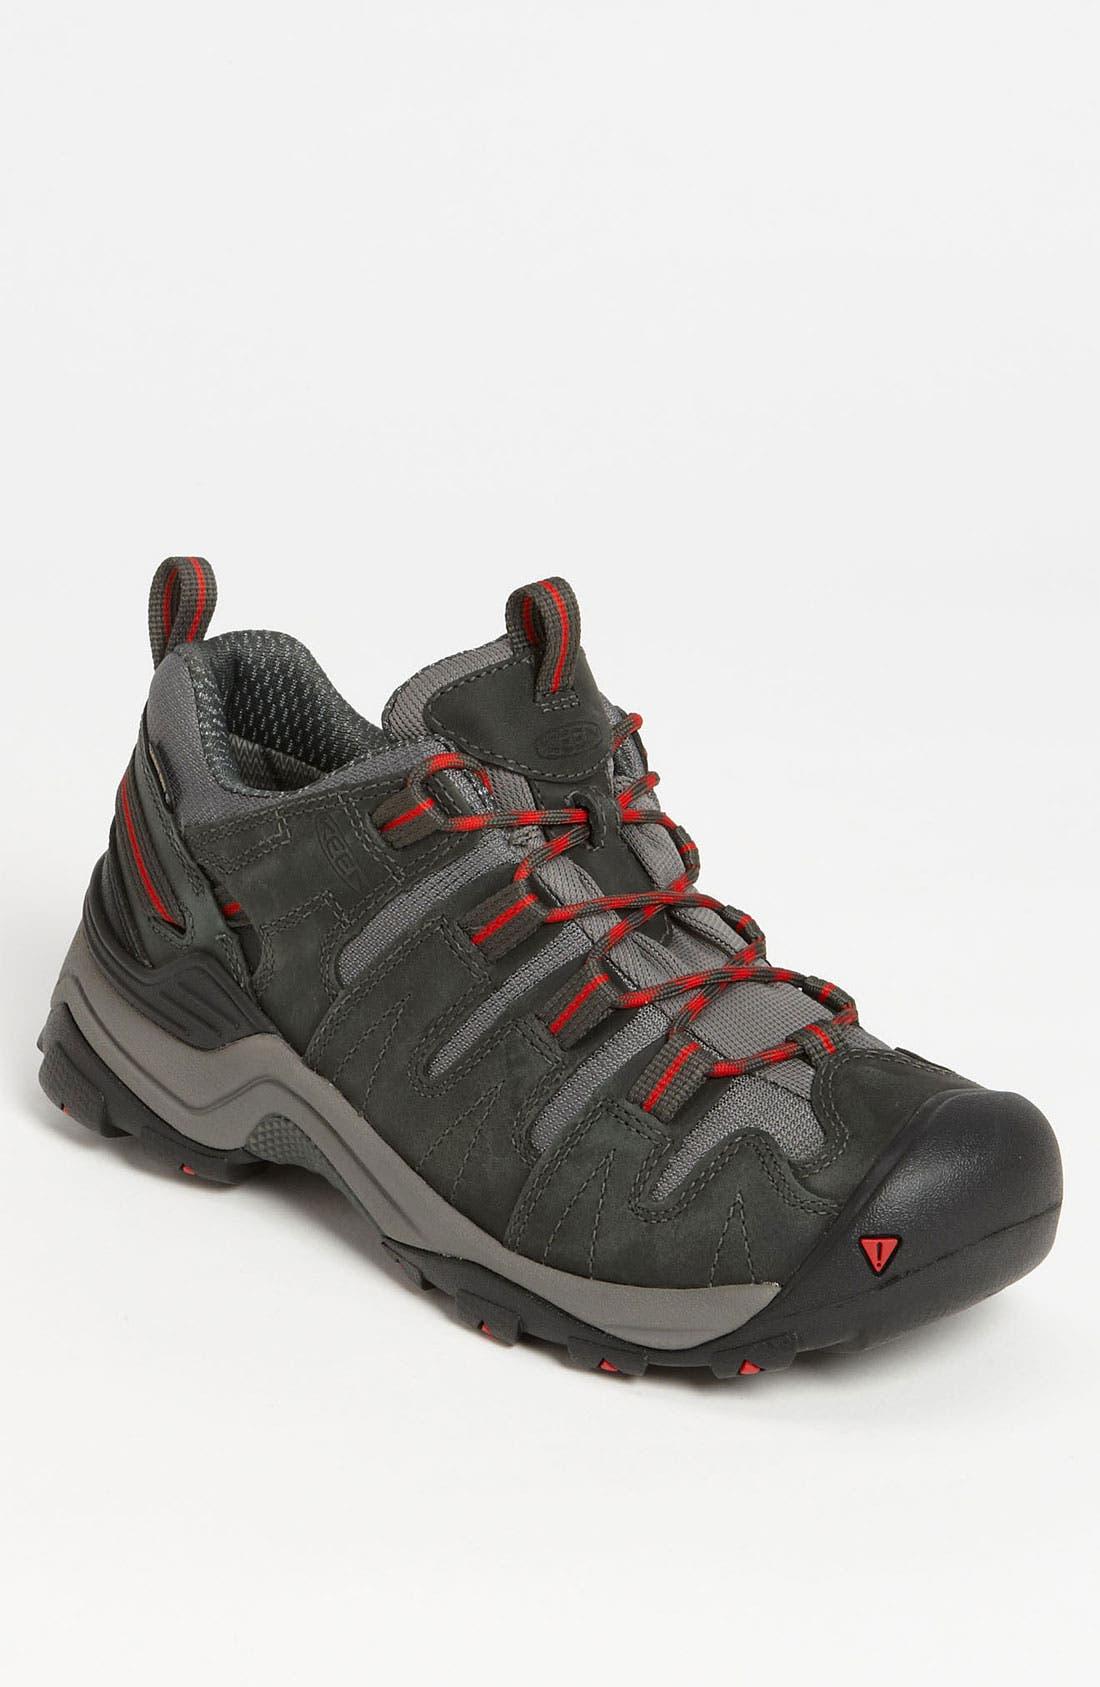 Main Image - Keen 'Gypsum' Hiking Shoe (Men) (Online Only)